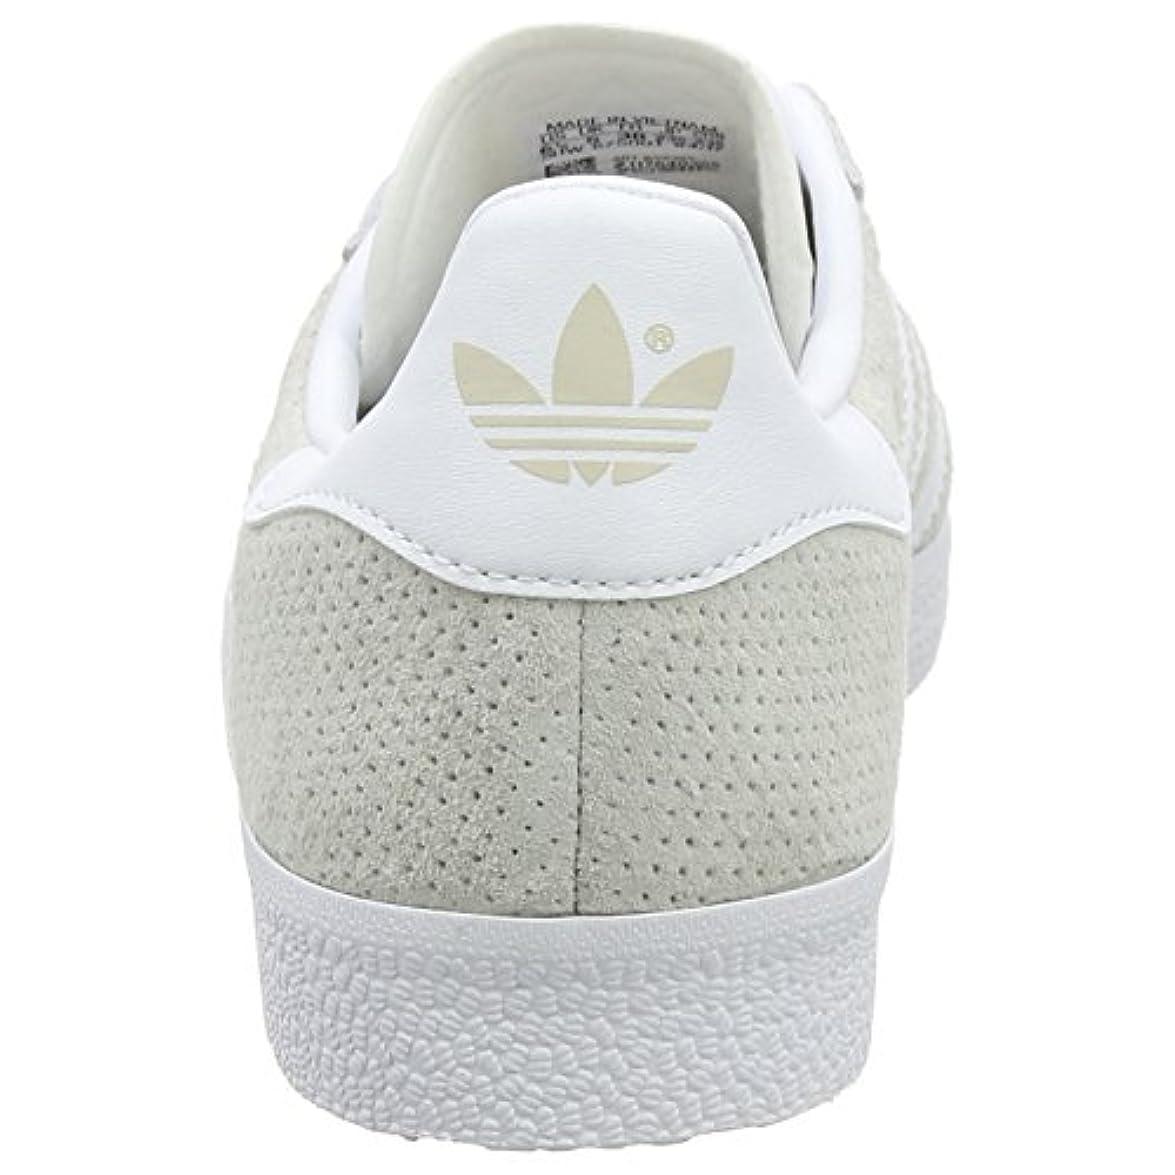 Adidas Gazelle W Scarpe Da Ginnastica Basse Donna